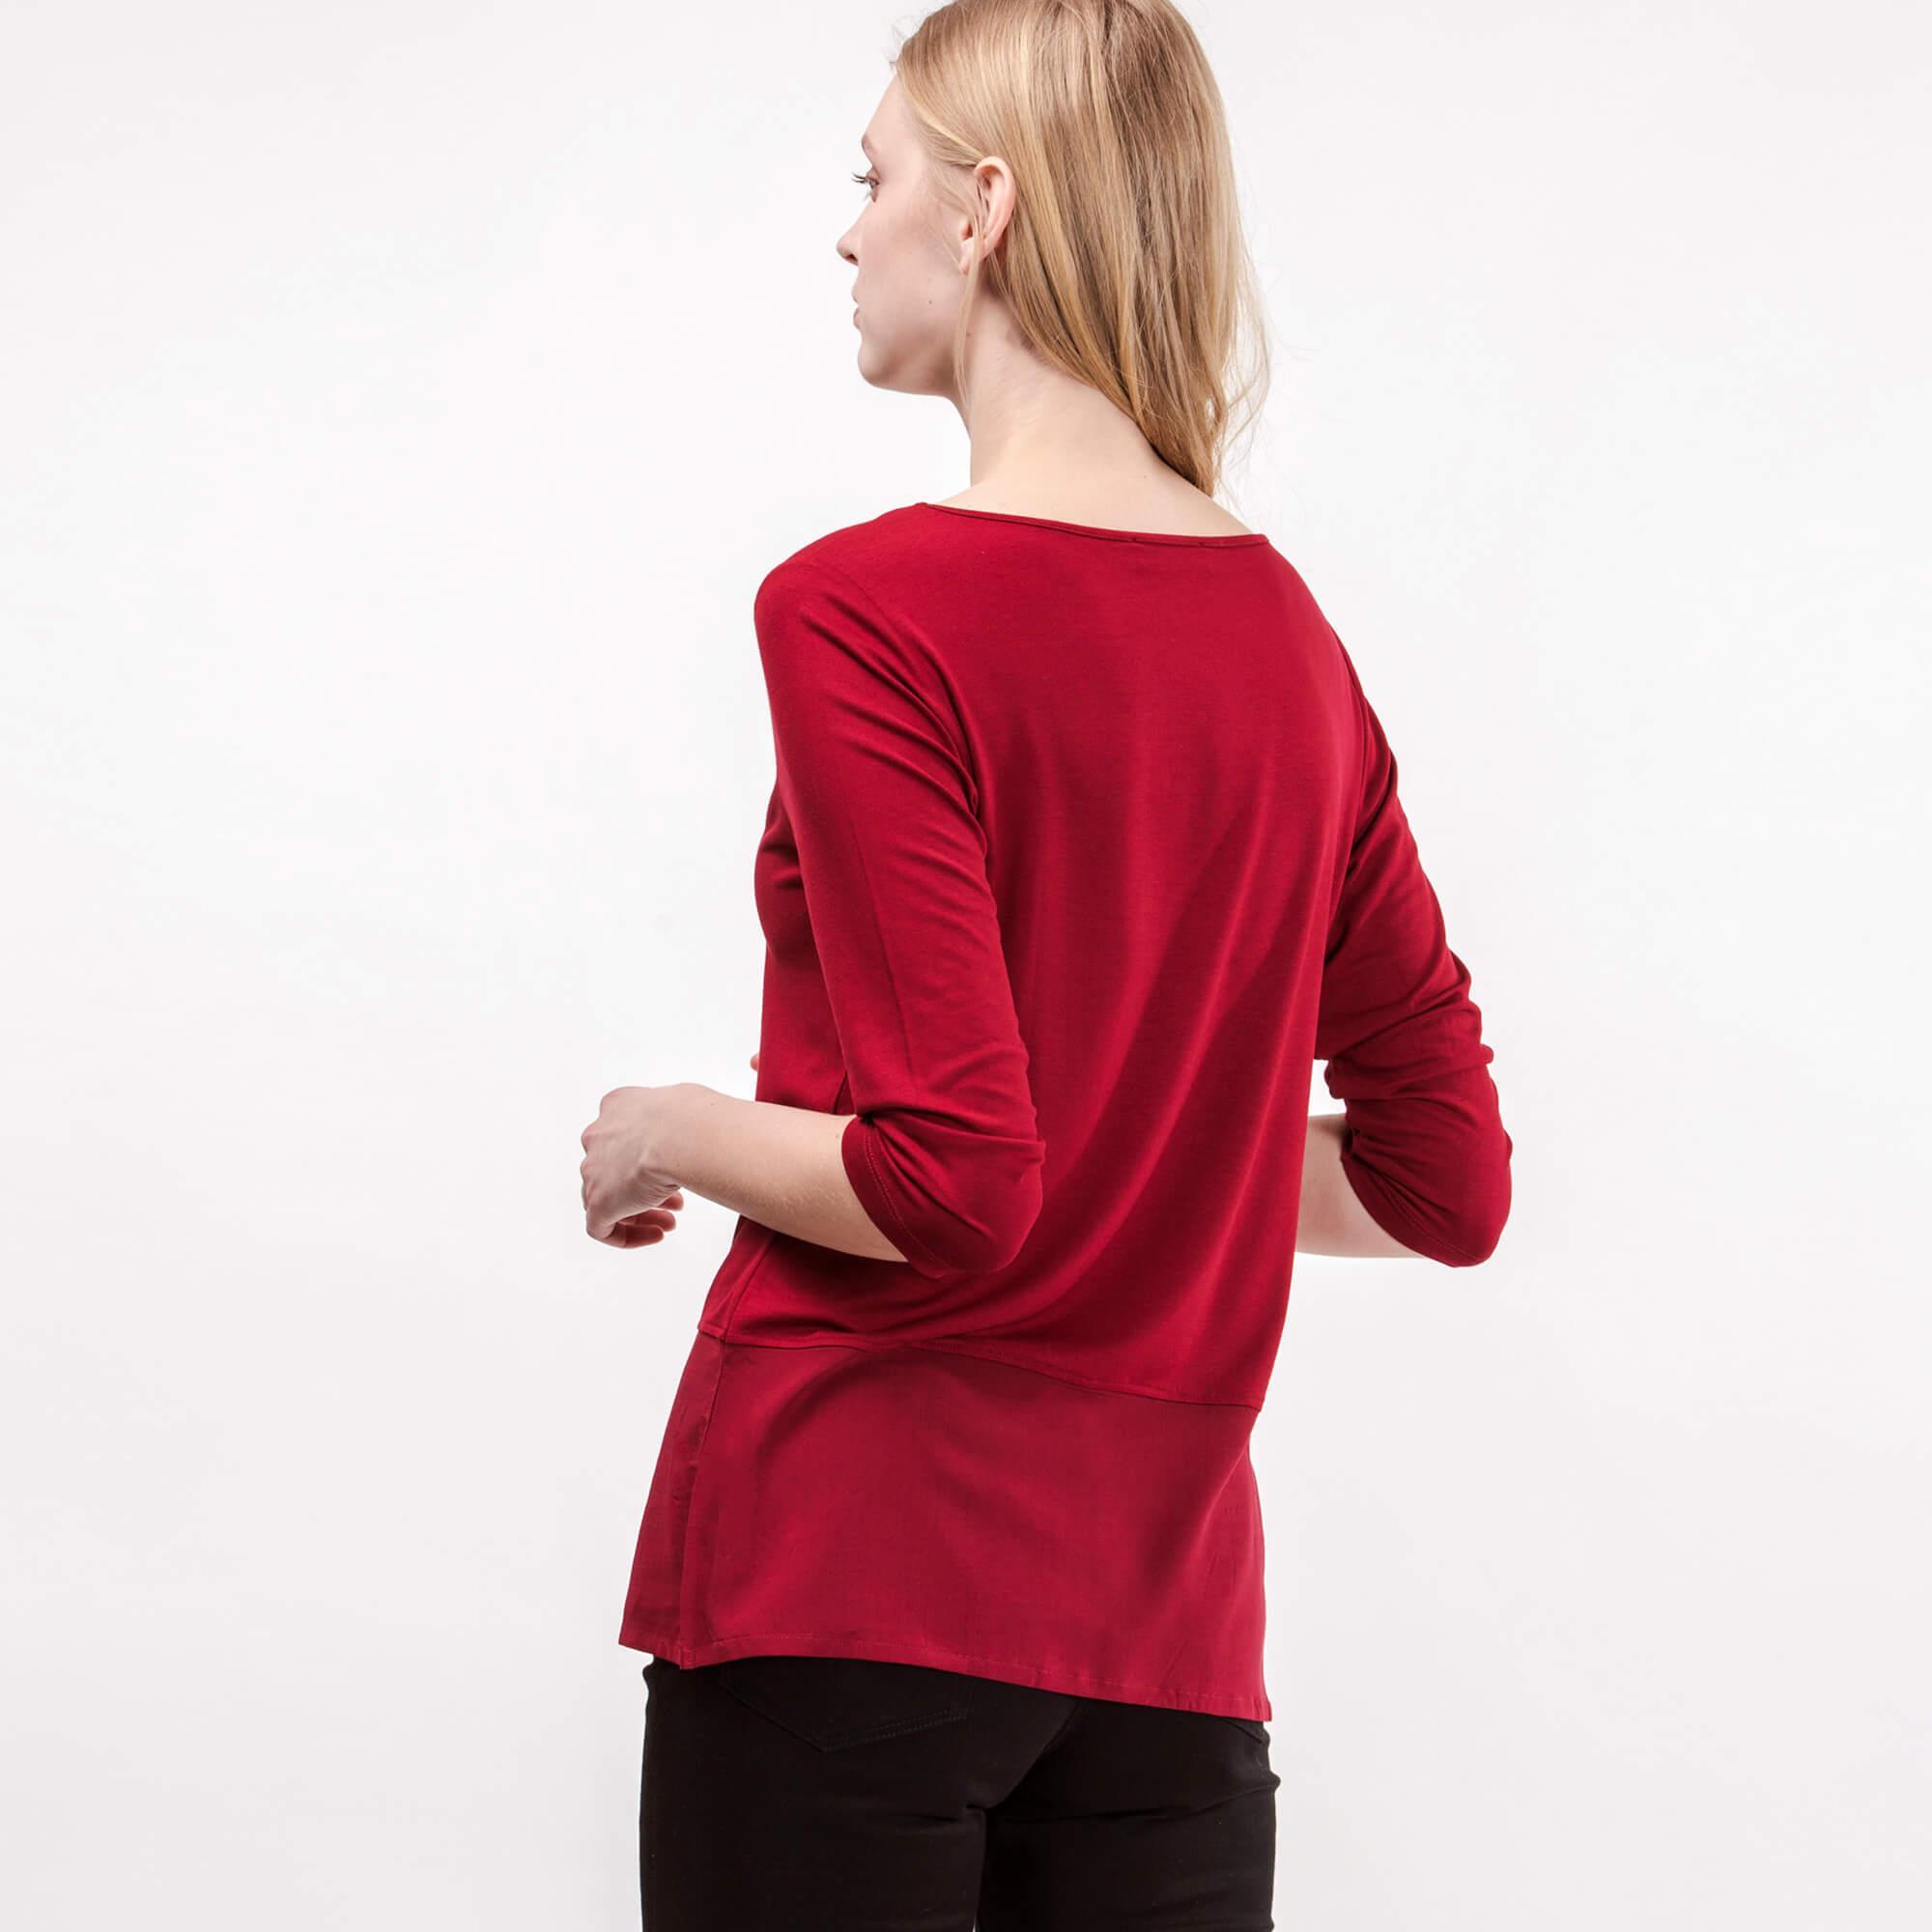 Lacoste Kadın Bordo V Yaka T-Shirt